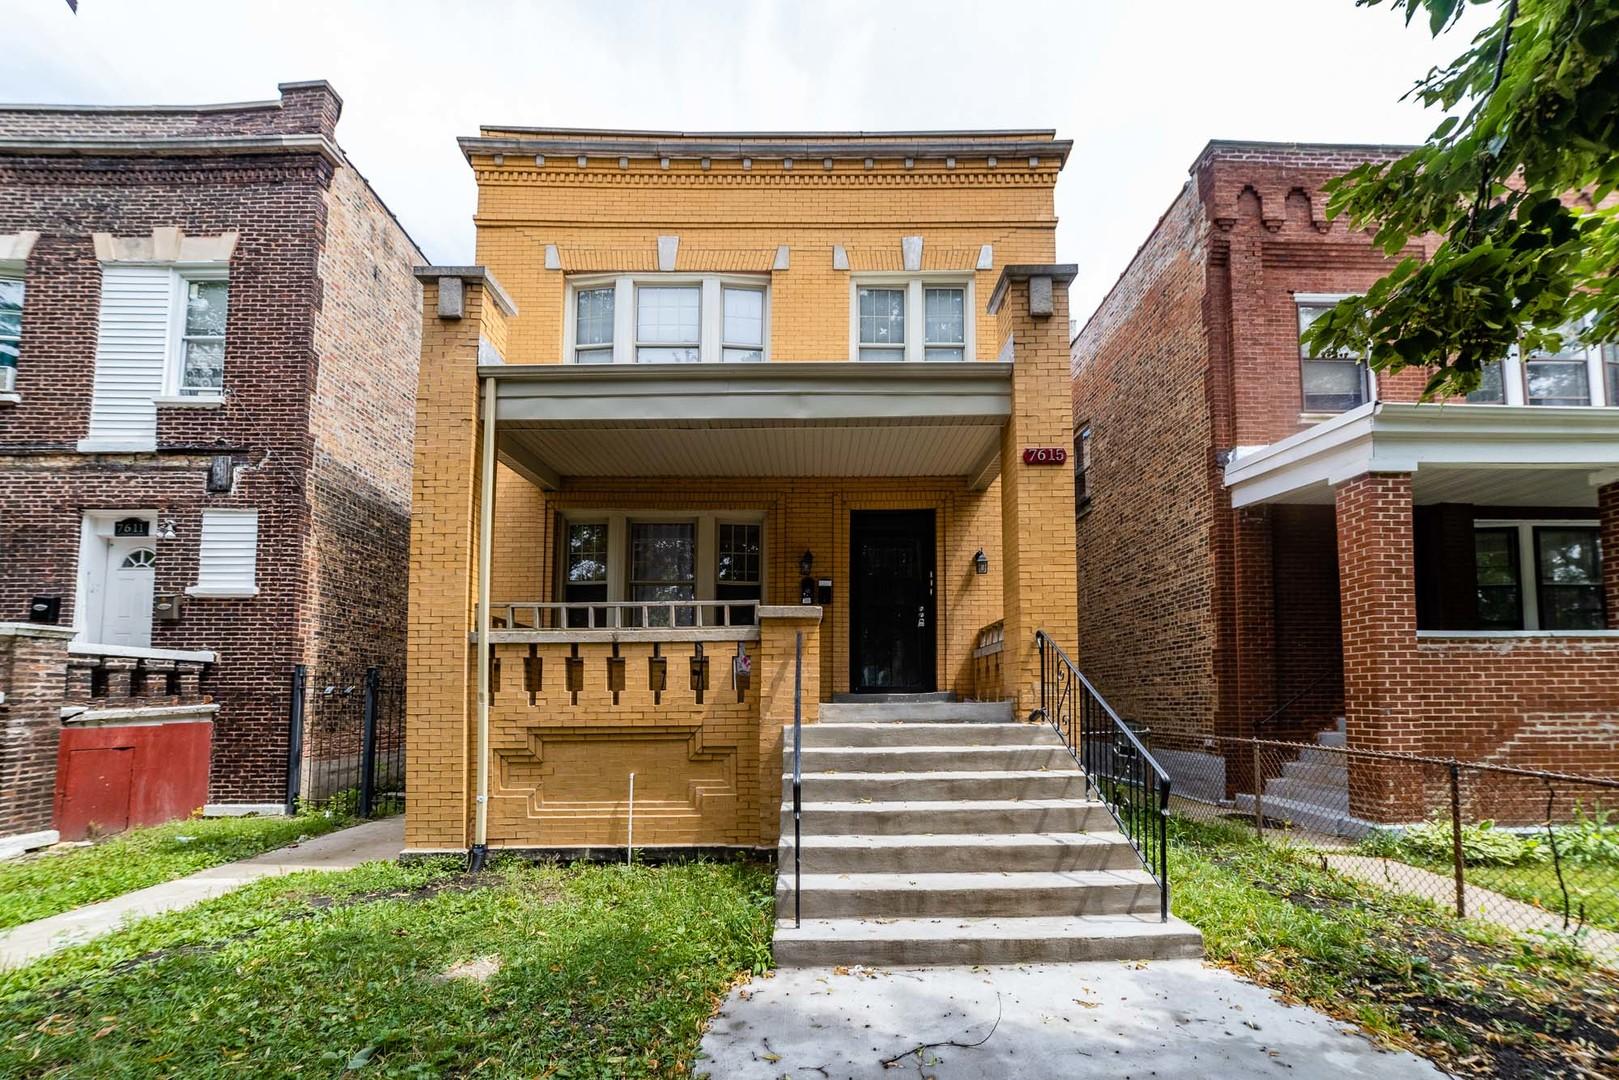 7615 S Morgan Street, Chicago, IL 60620